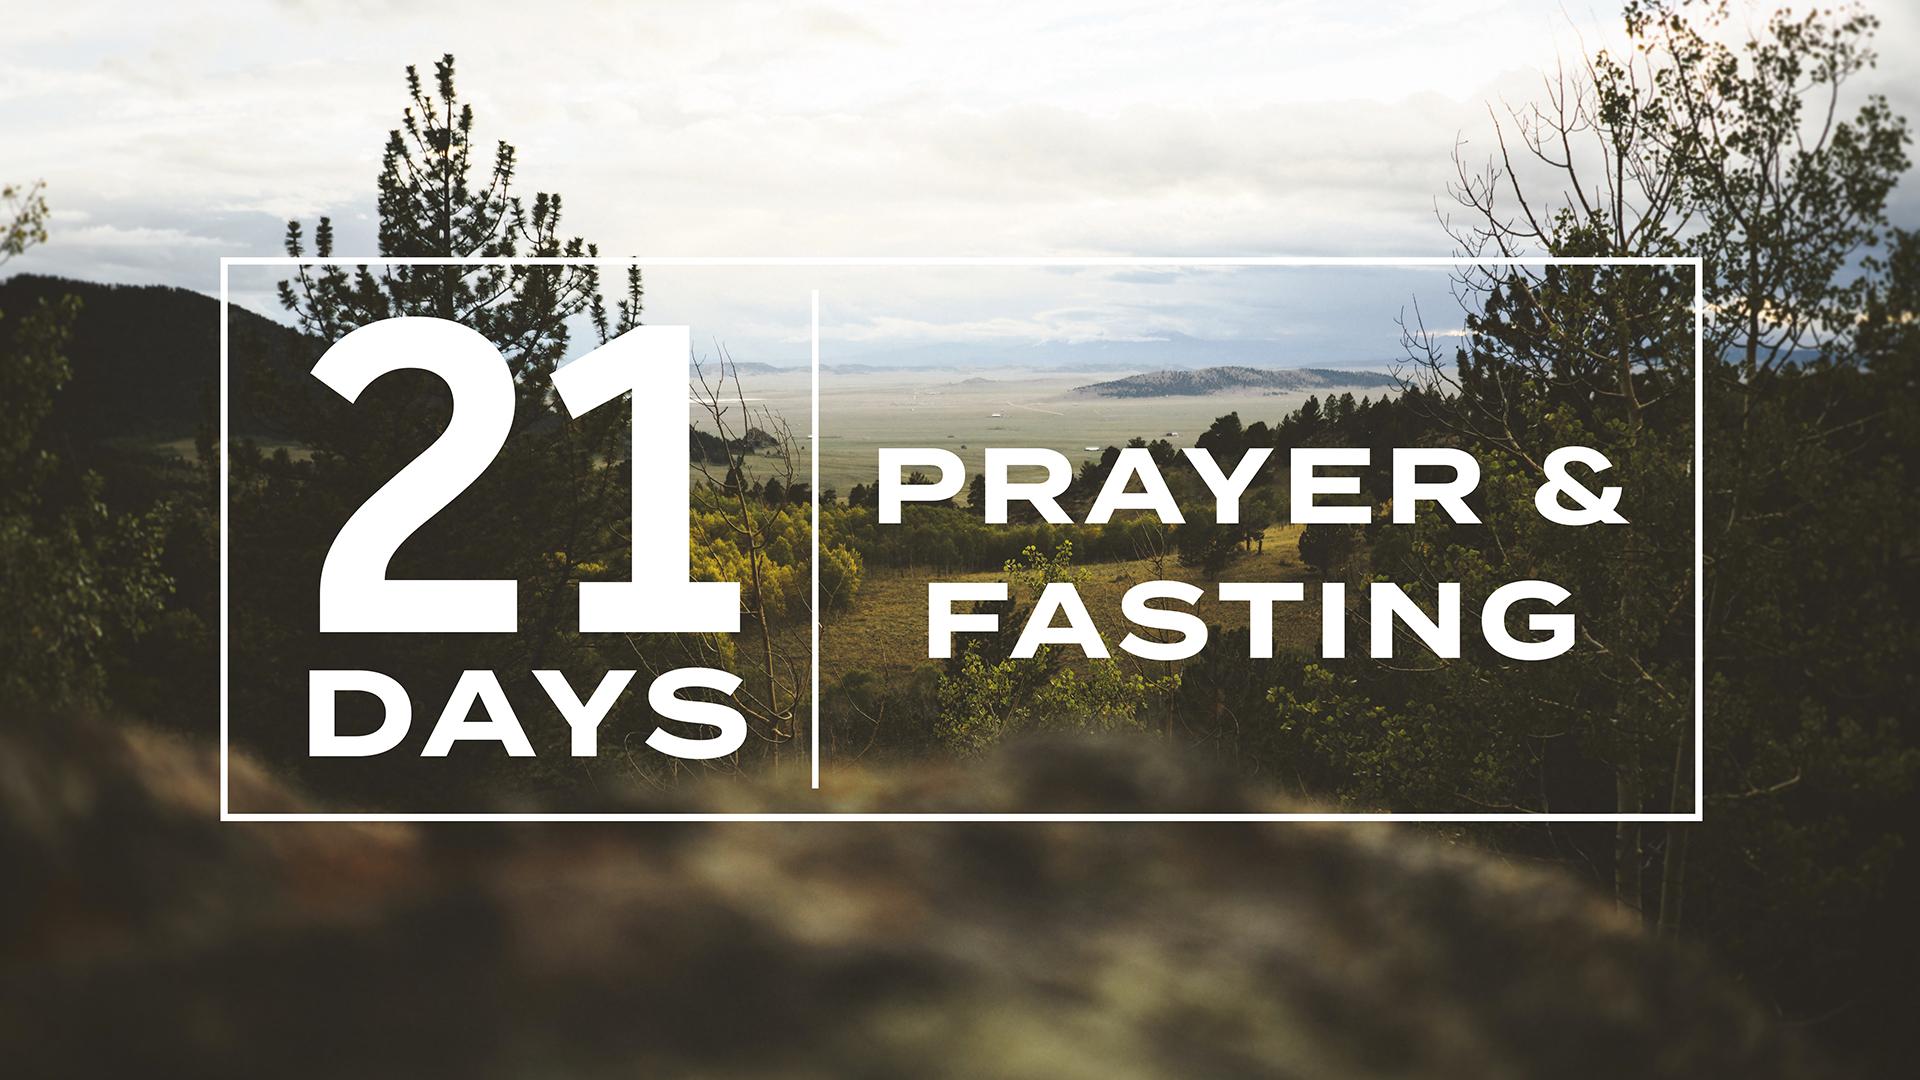 21 DAYS FASTING AND PRAYER